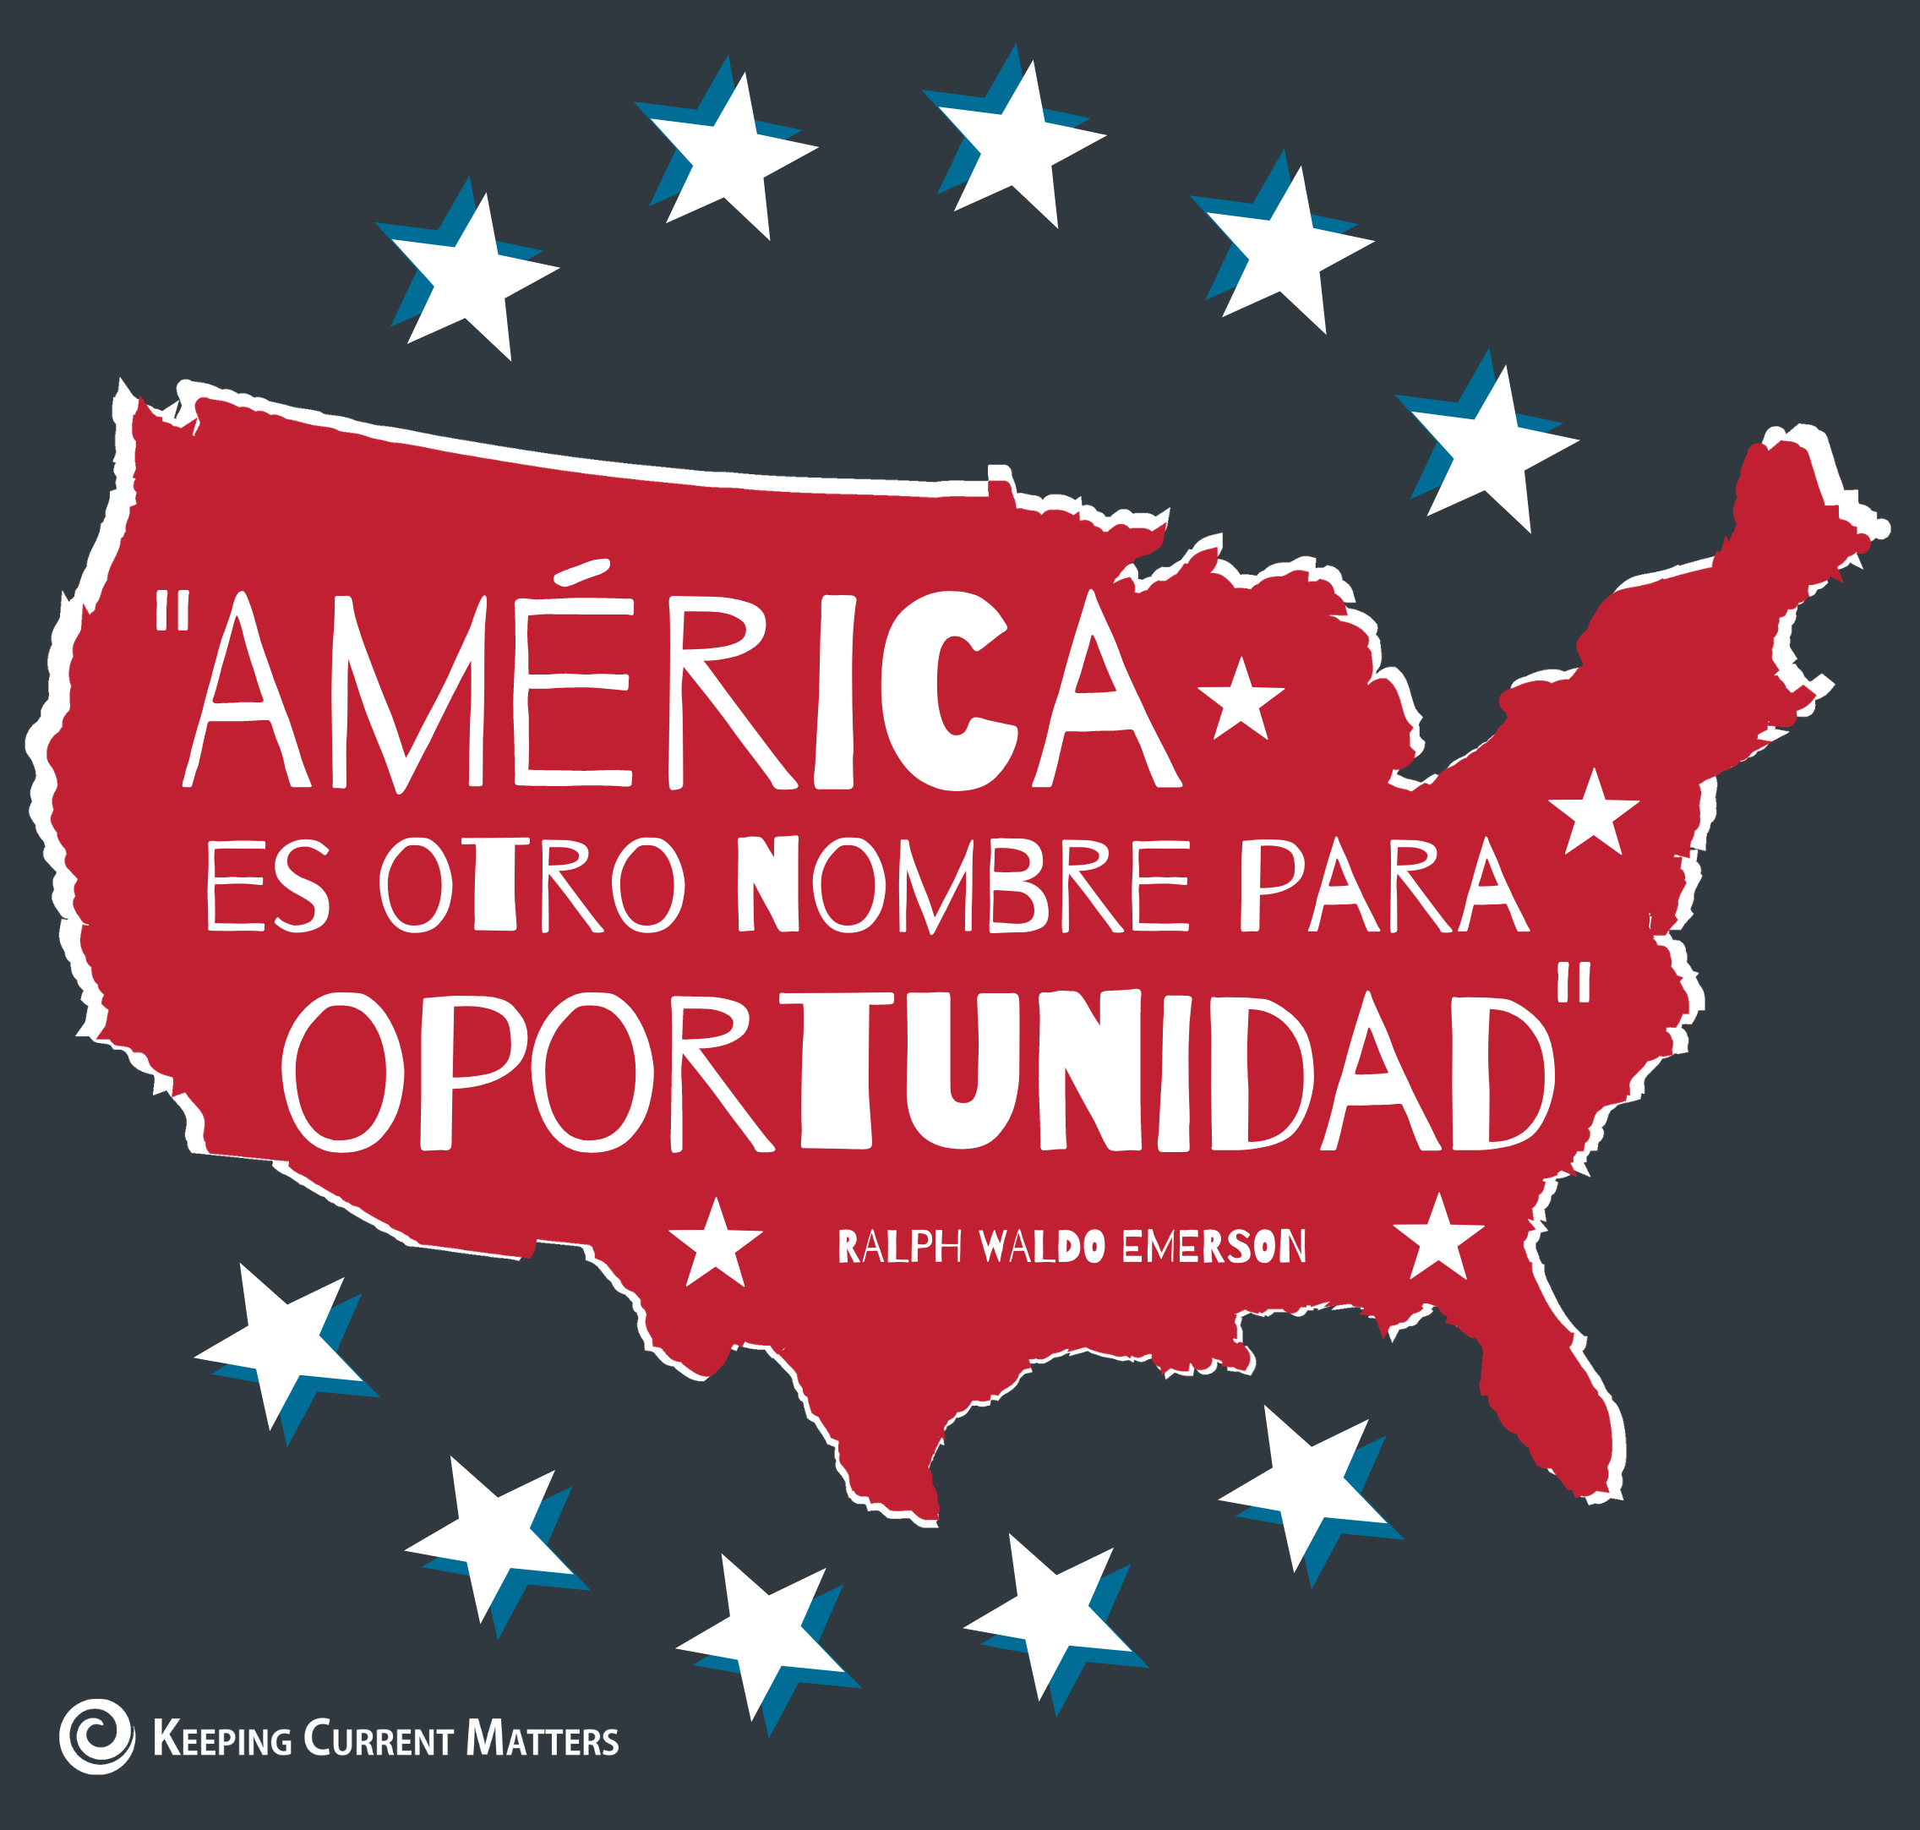 América es otro nombre para oportunidad [infografía] | Keeping Current Matters